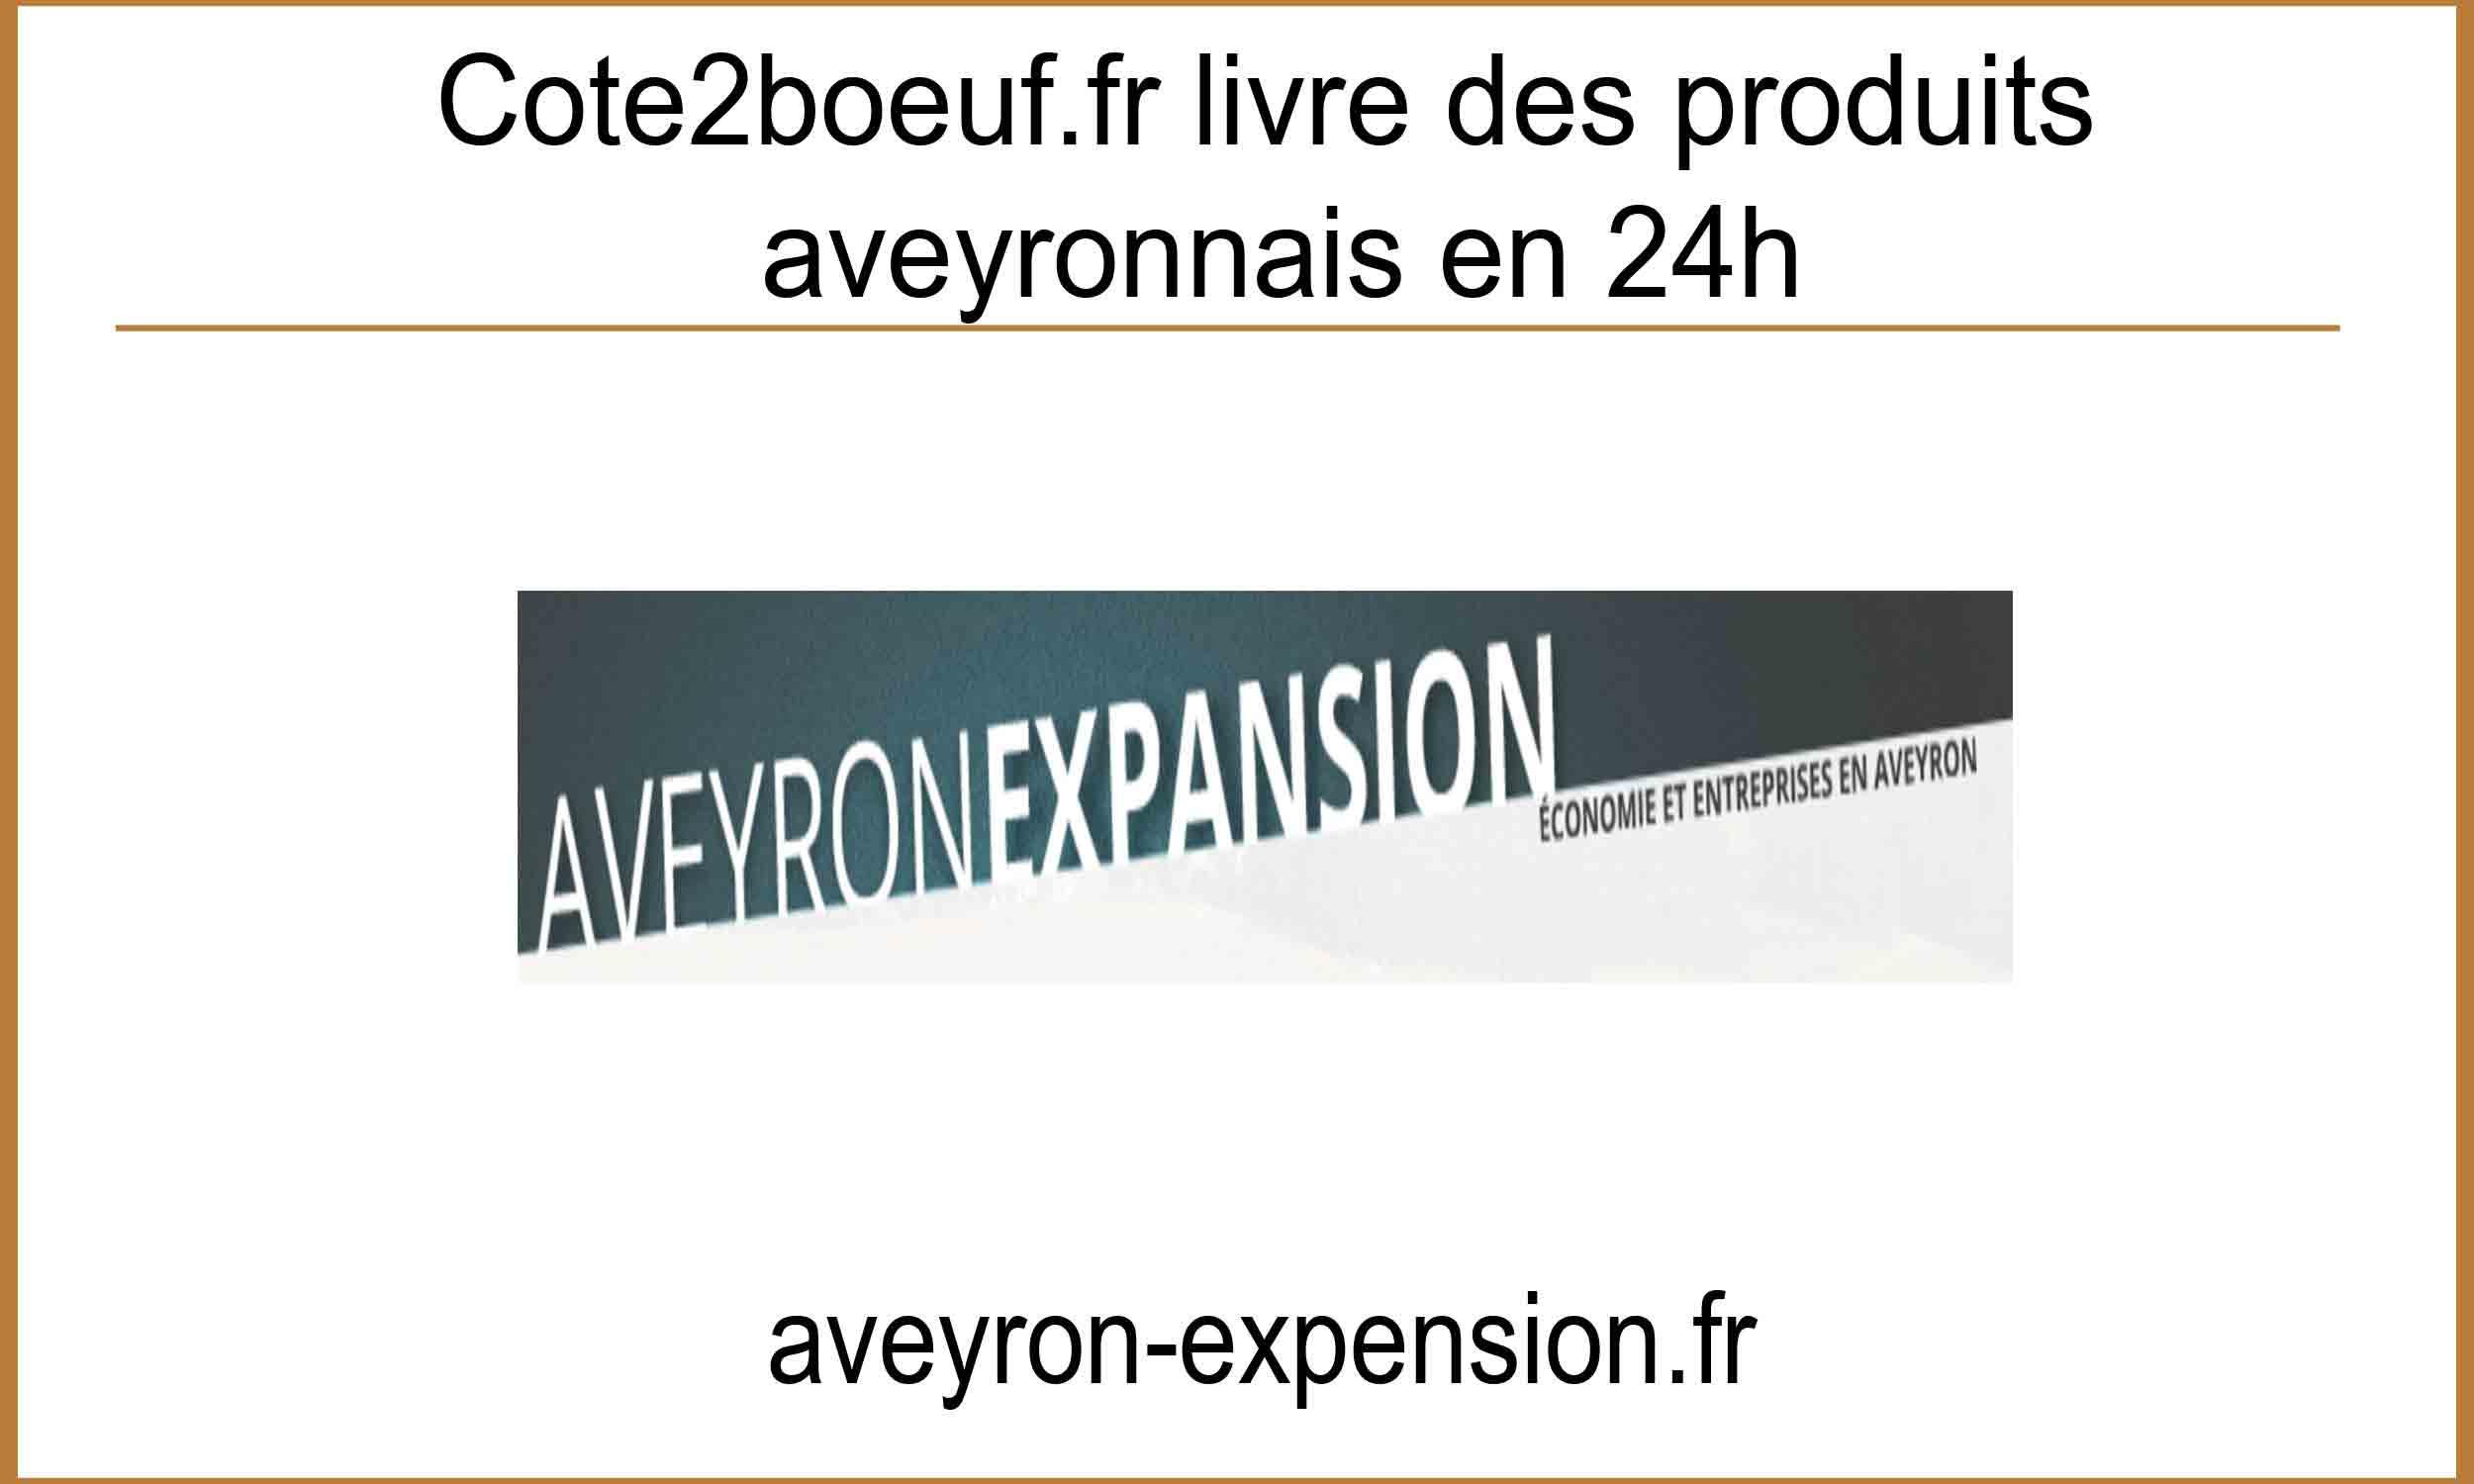 Aveyron expension